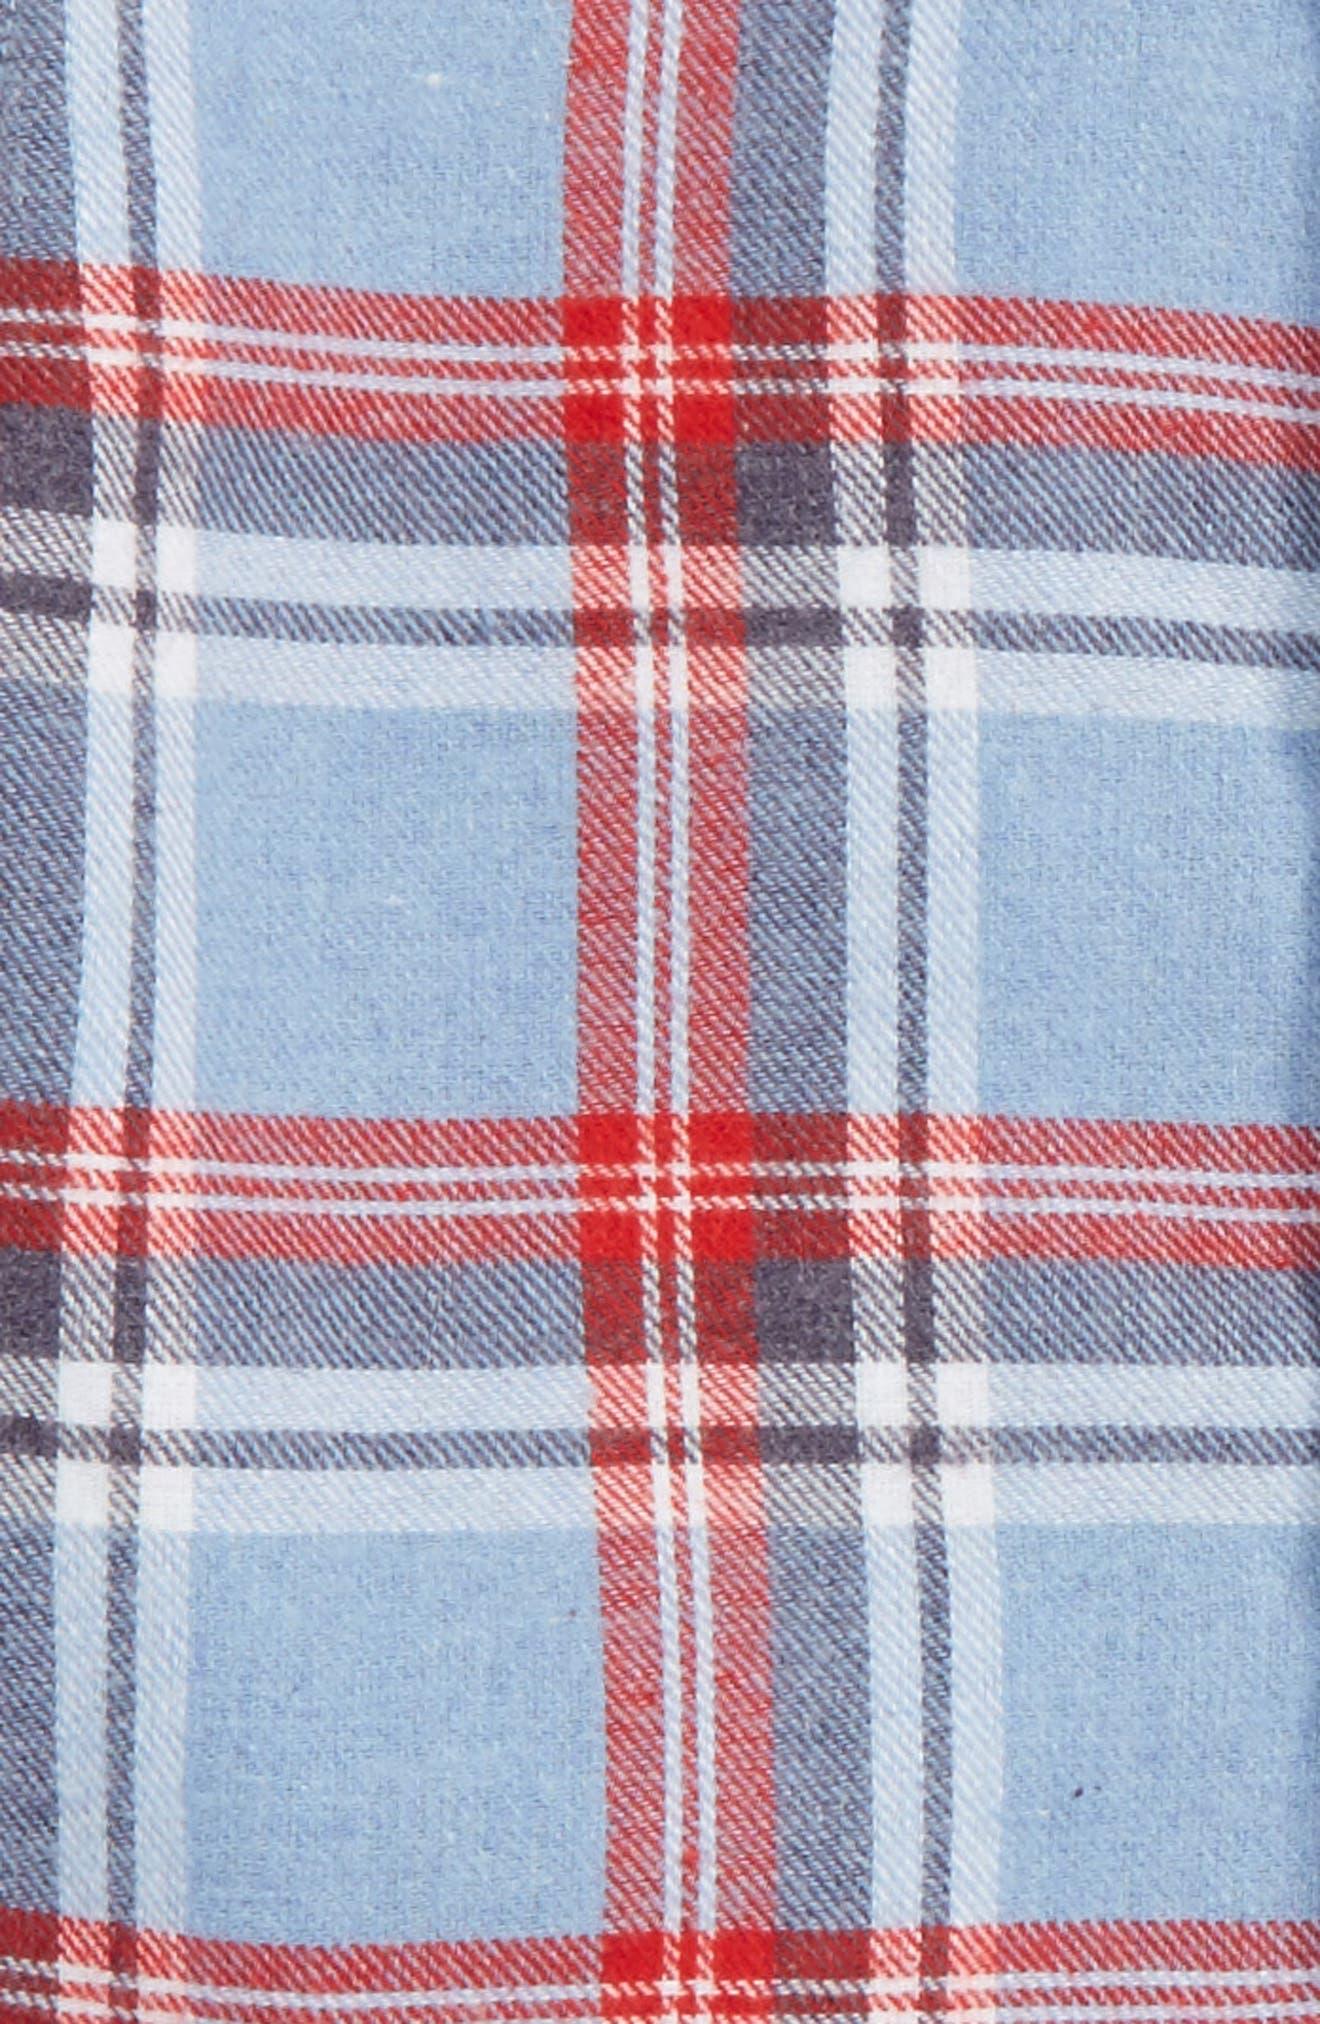 Alternate Image 2  - Andy & Evan Plaid Flannel Shirt (Toddler Boys & Little Boys)